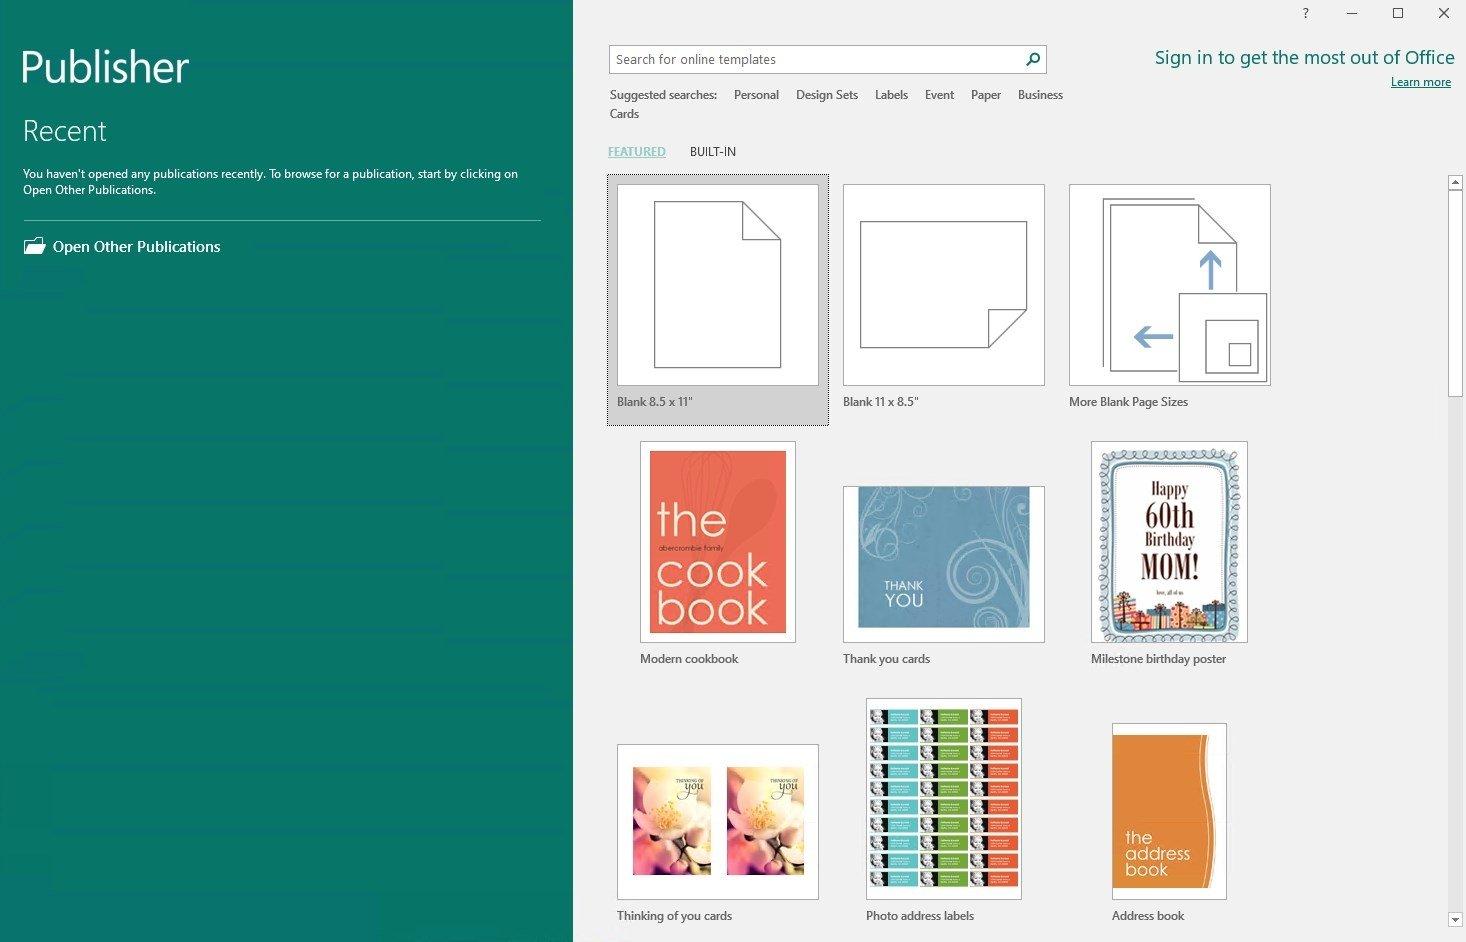 download office 2016 gratis completo portugues